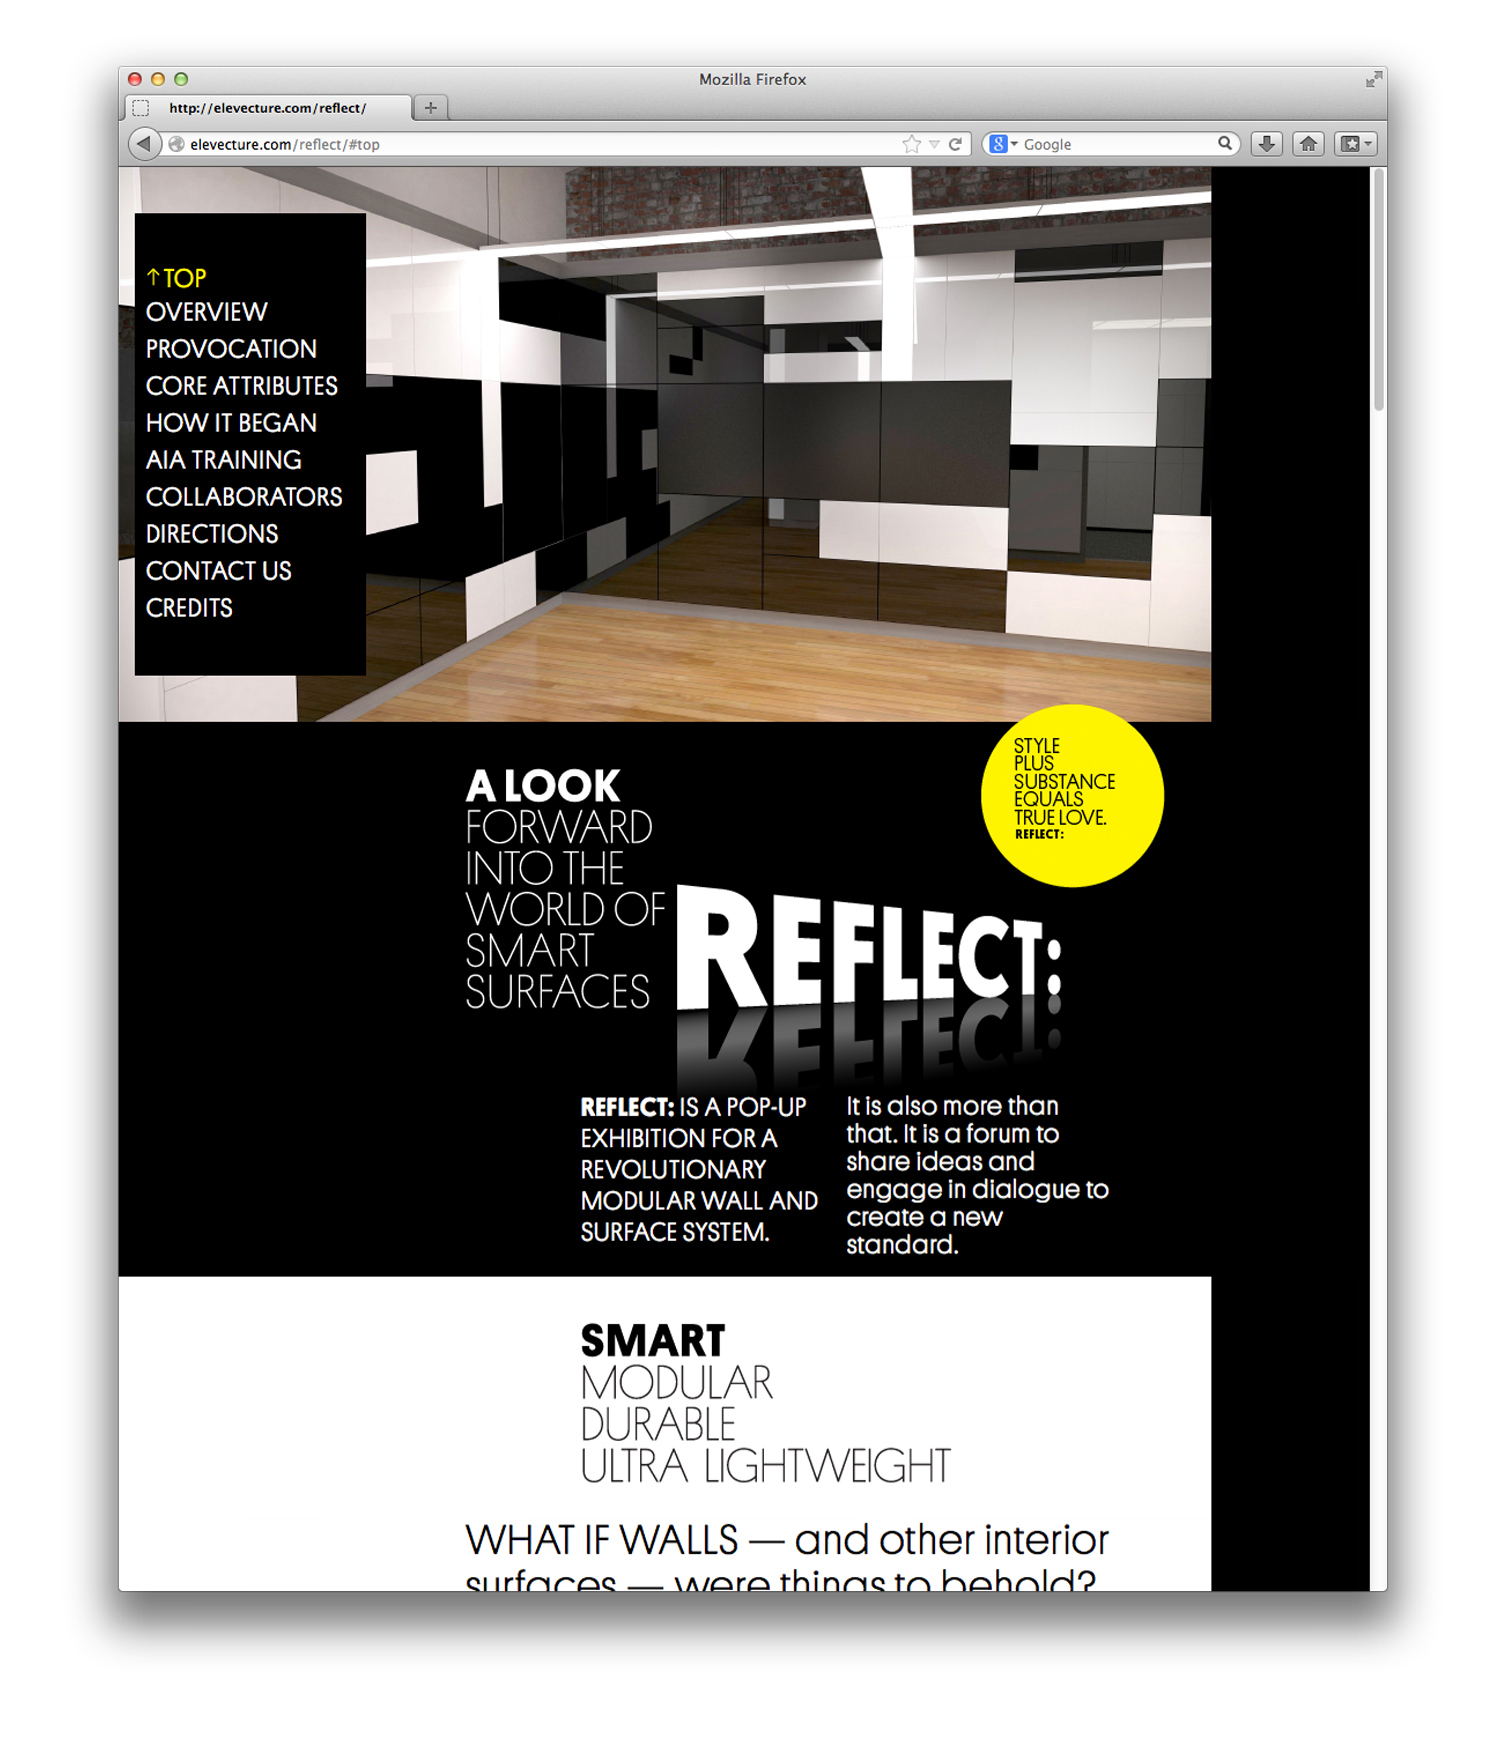 reflect_website_1.jpg